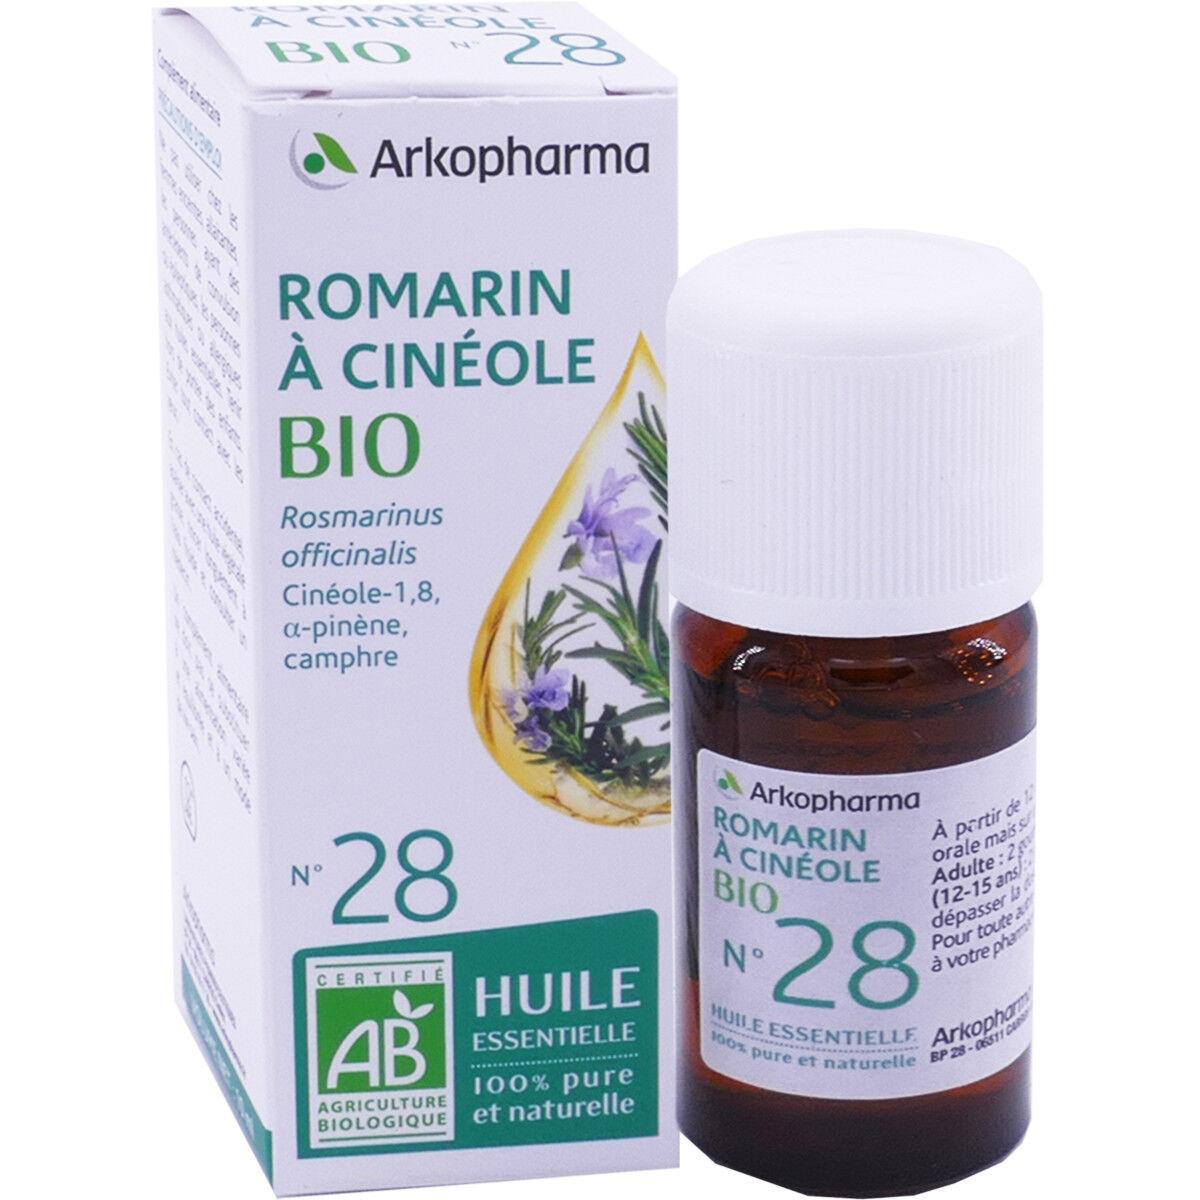 Arkopharma huile essentielle romarin a cineole bio n°28 10 ml